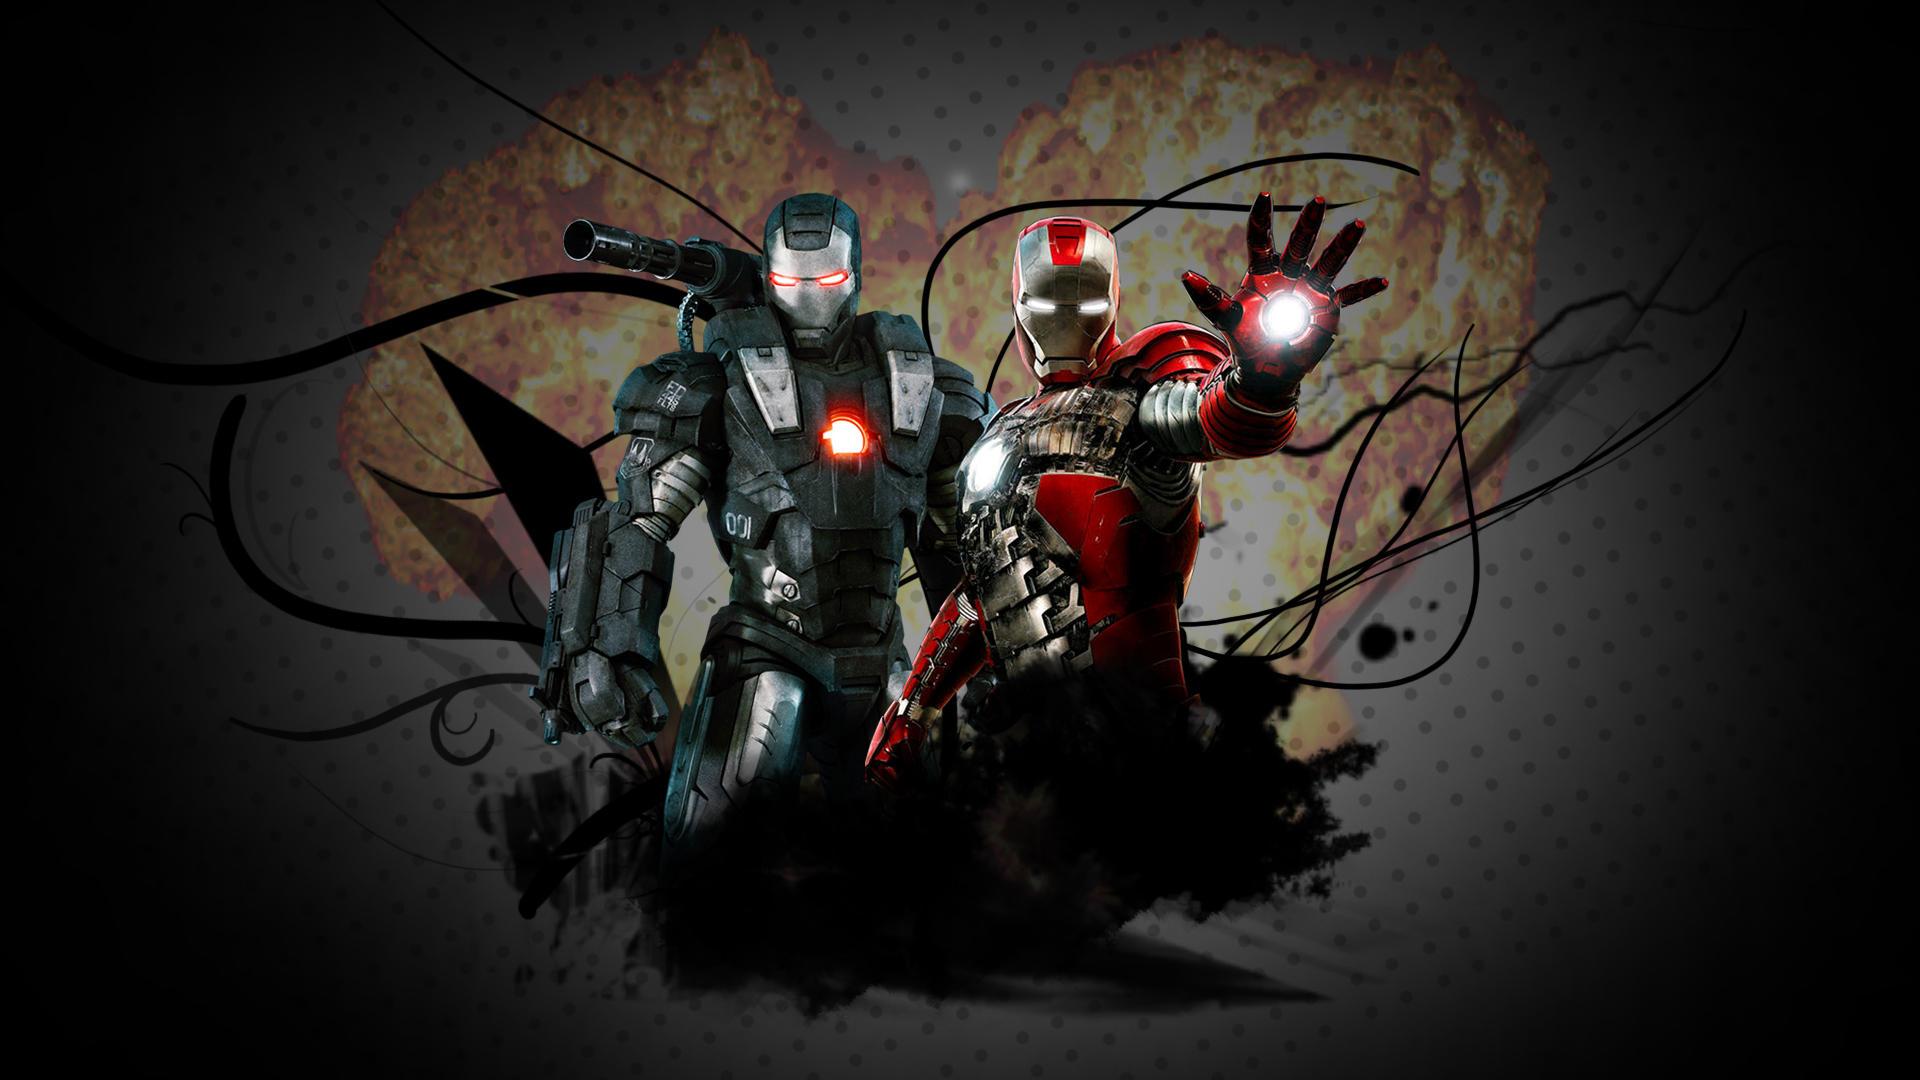 Harley Davidson Ironman